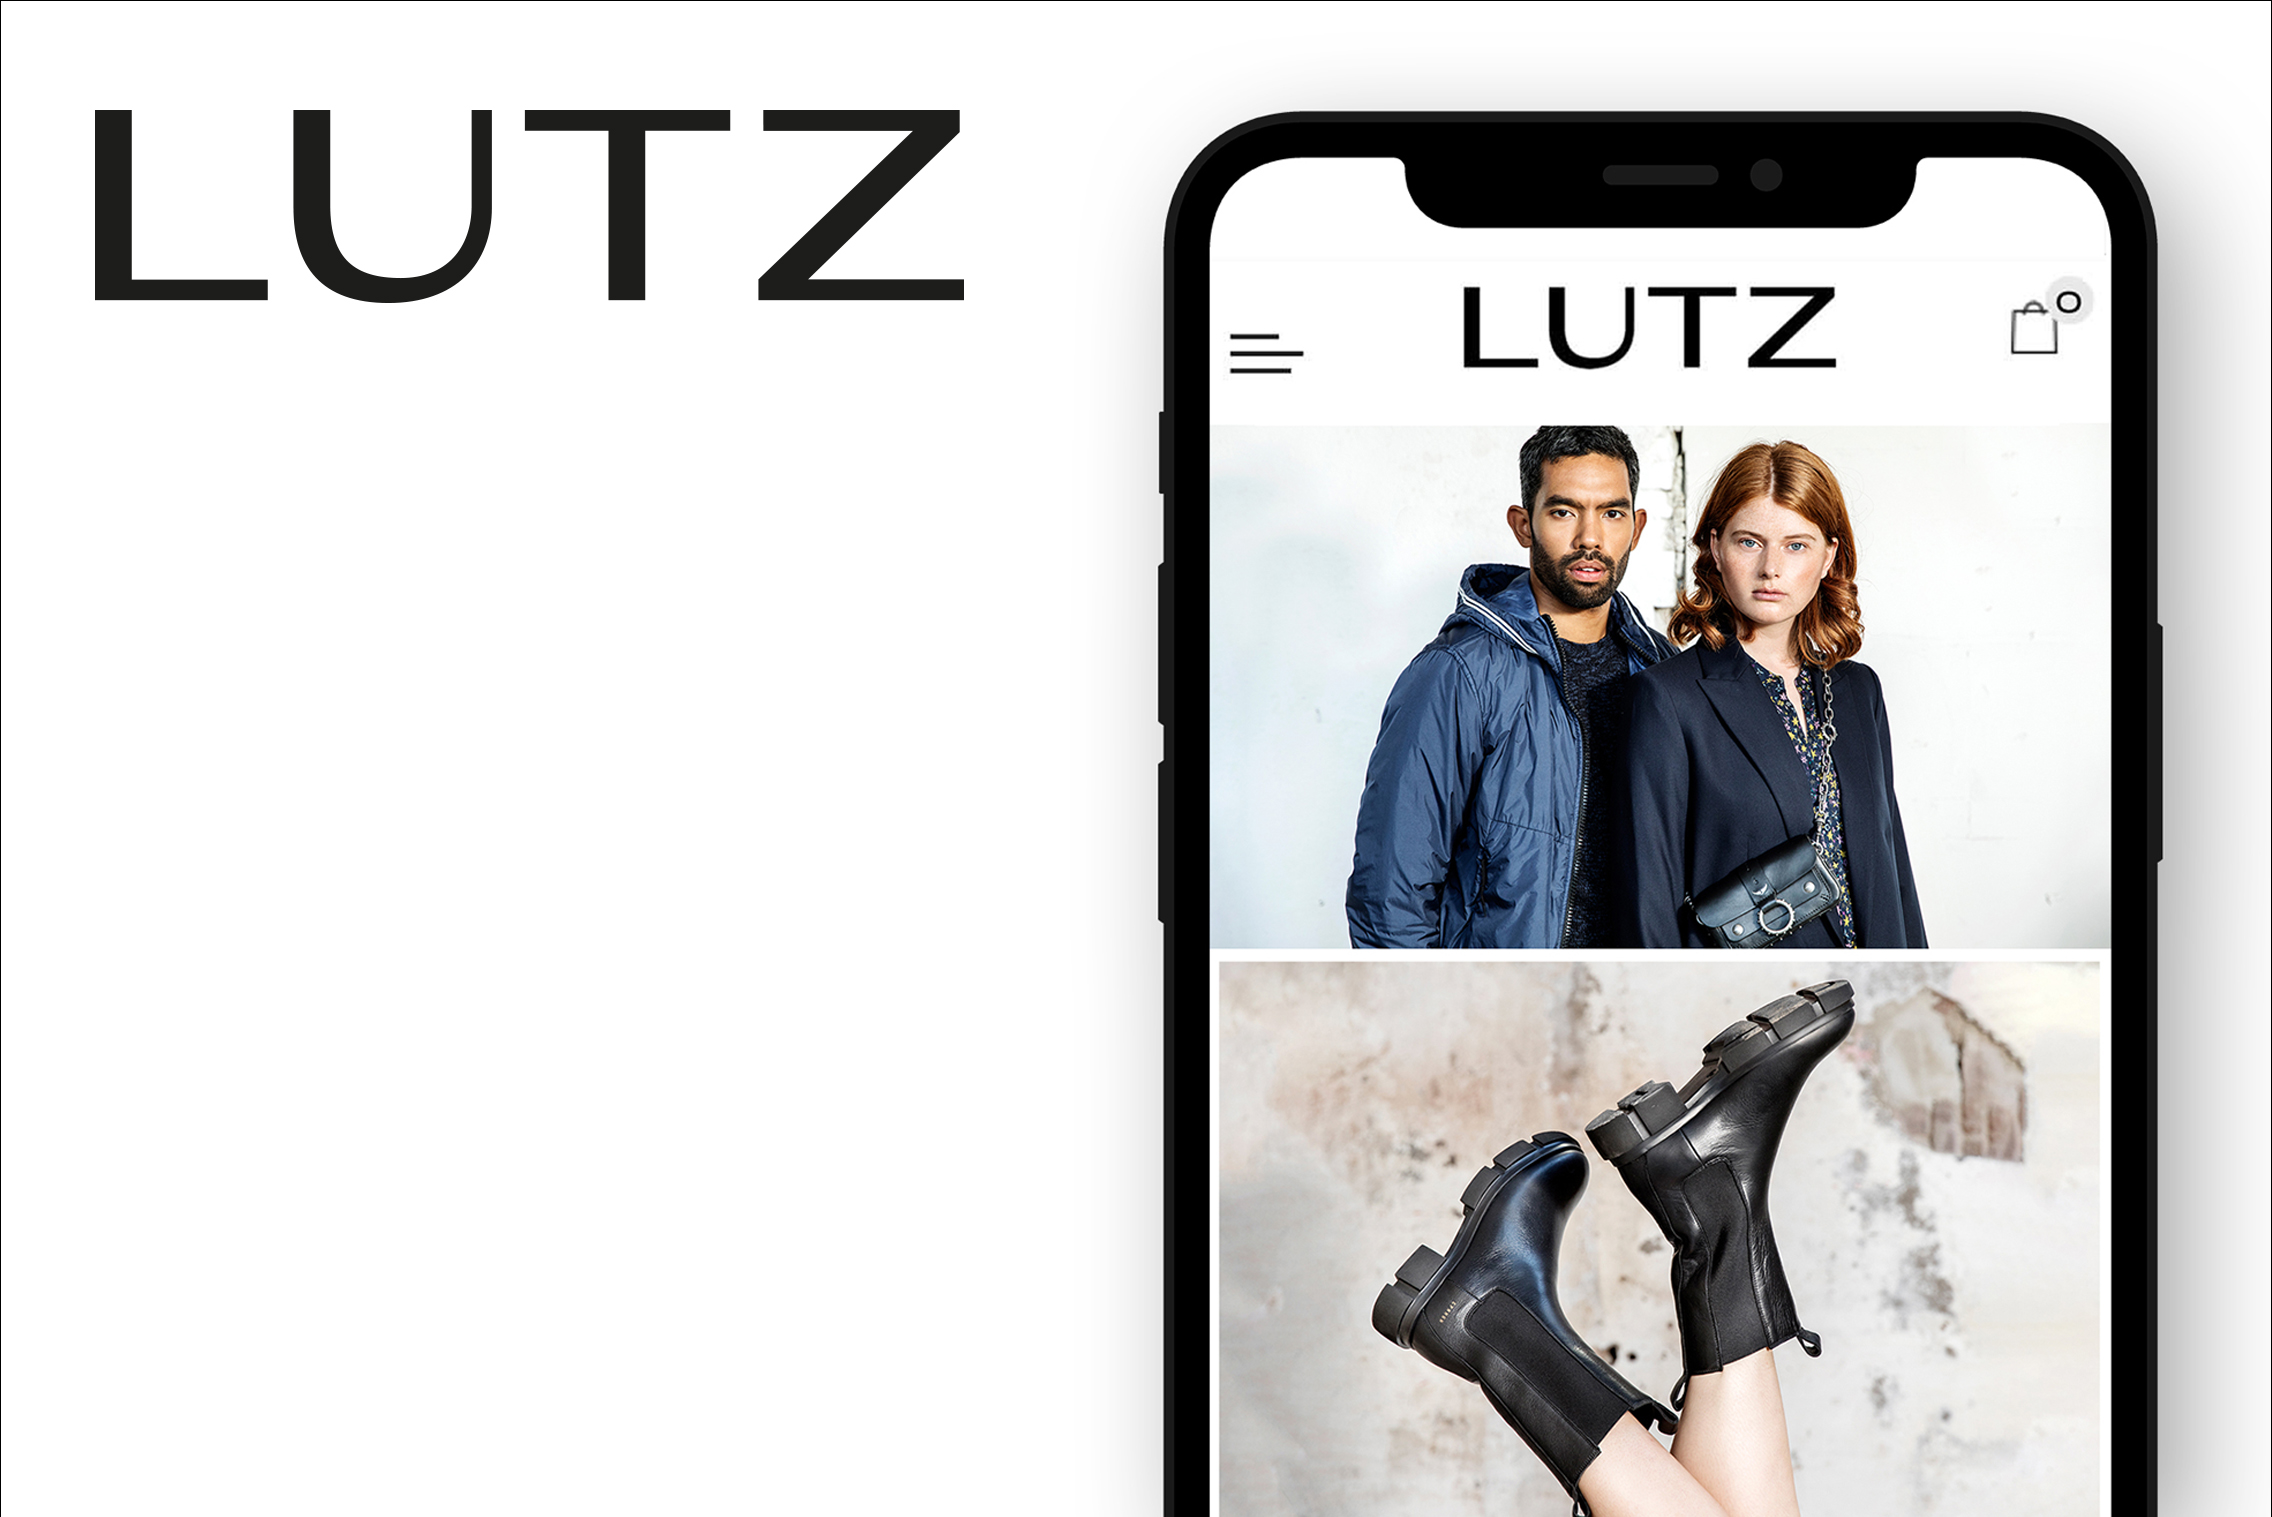 LUTZ 2.0